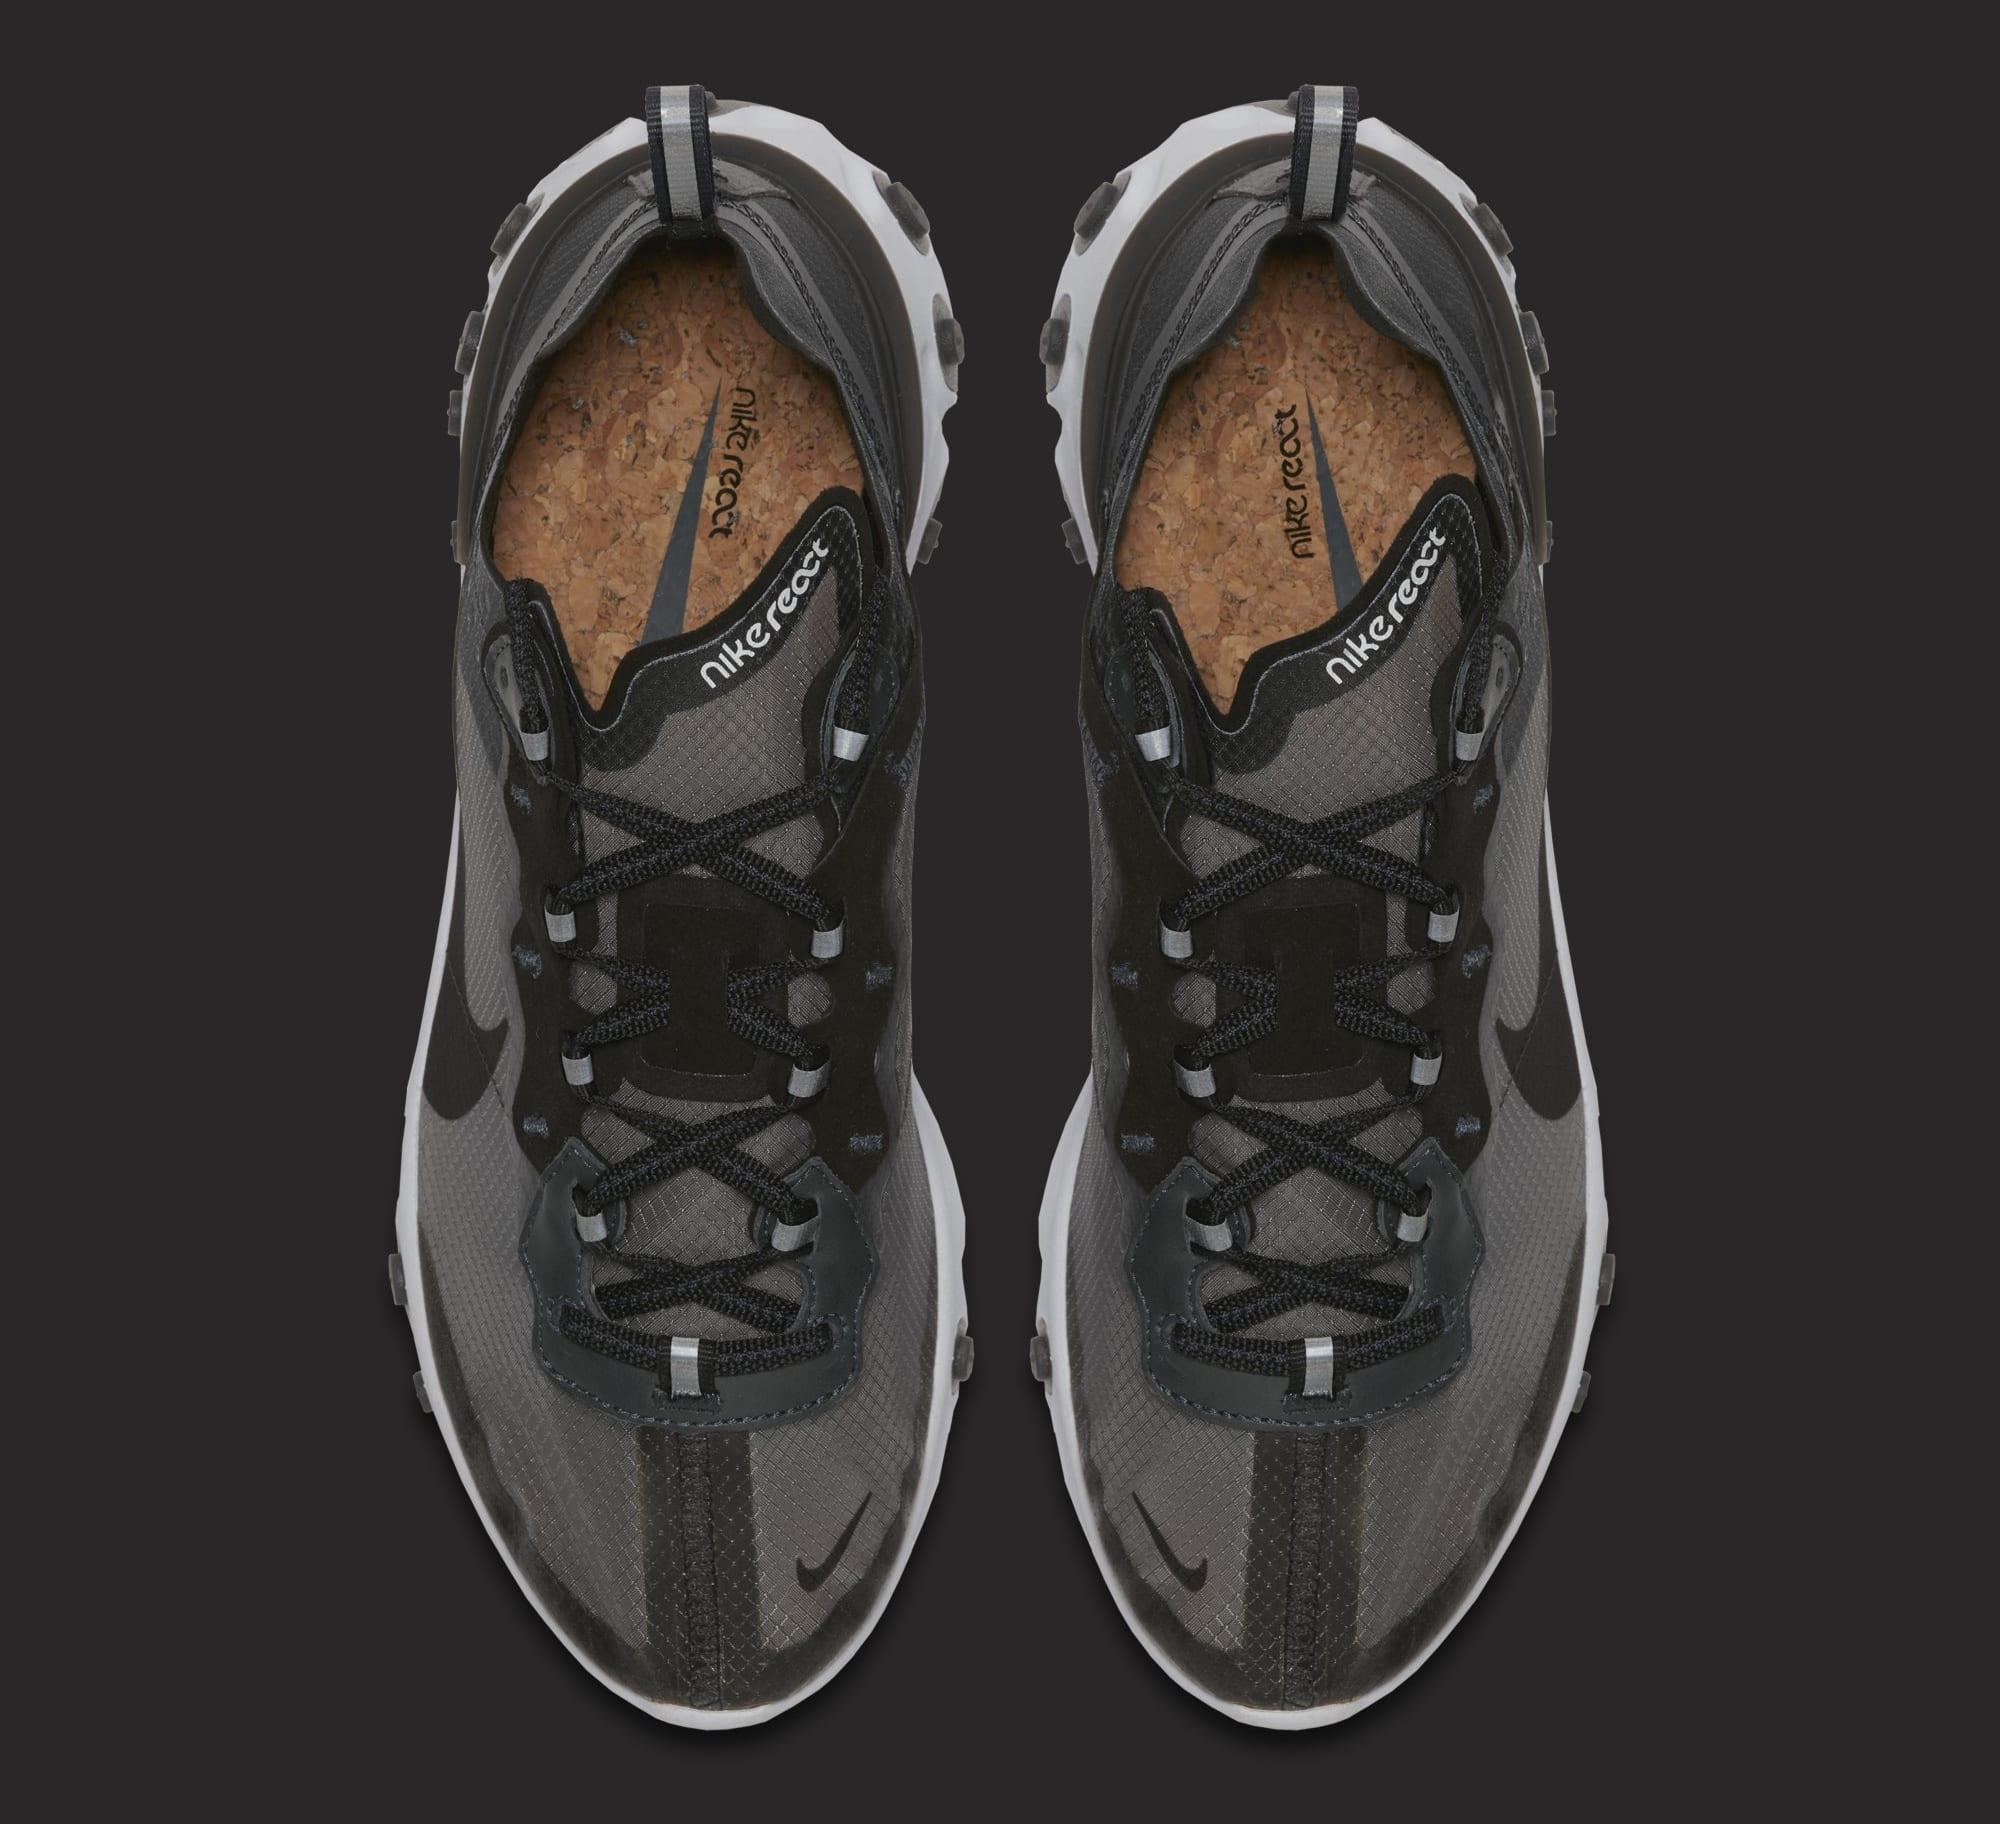 Nike React Element 87 'Anthracite/Black/White' AQ1090-001 (Top)